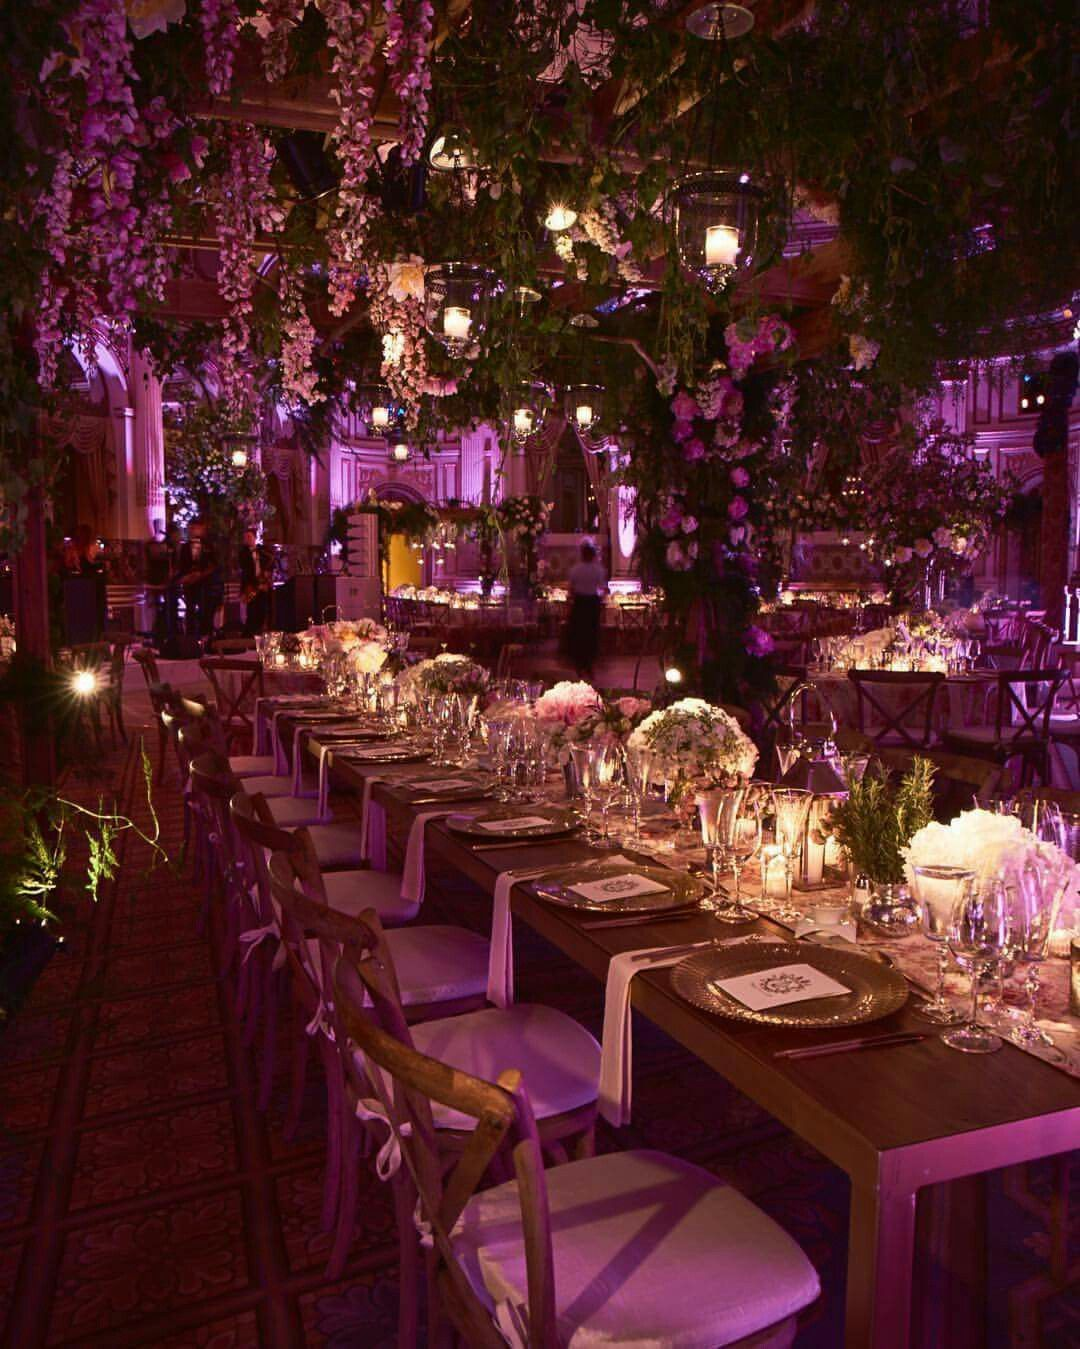 Wedding Venue Decoration Ideas: Wedding Decorations, Wedding